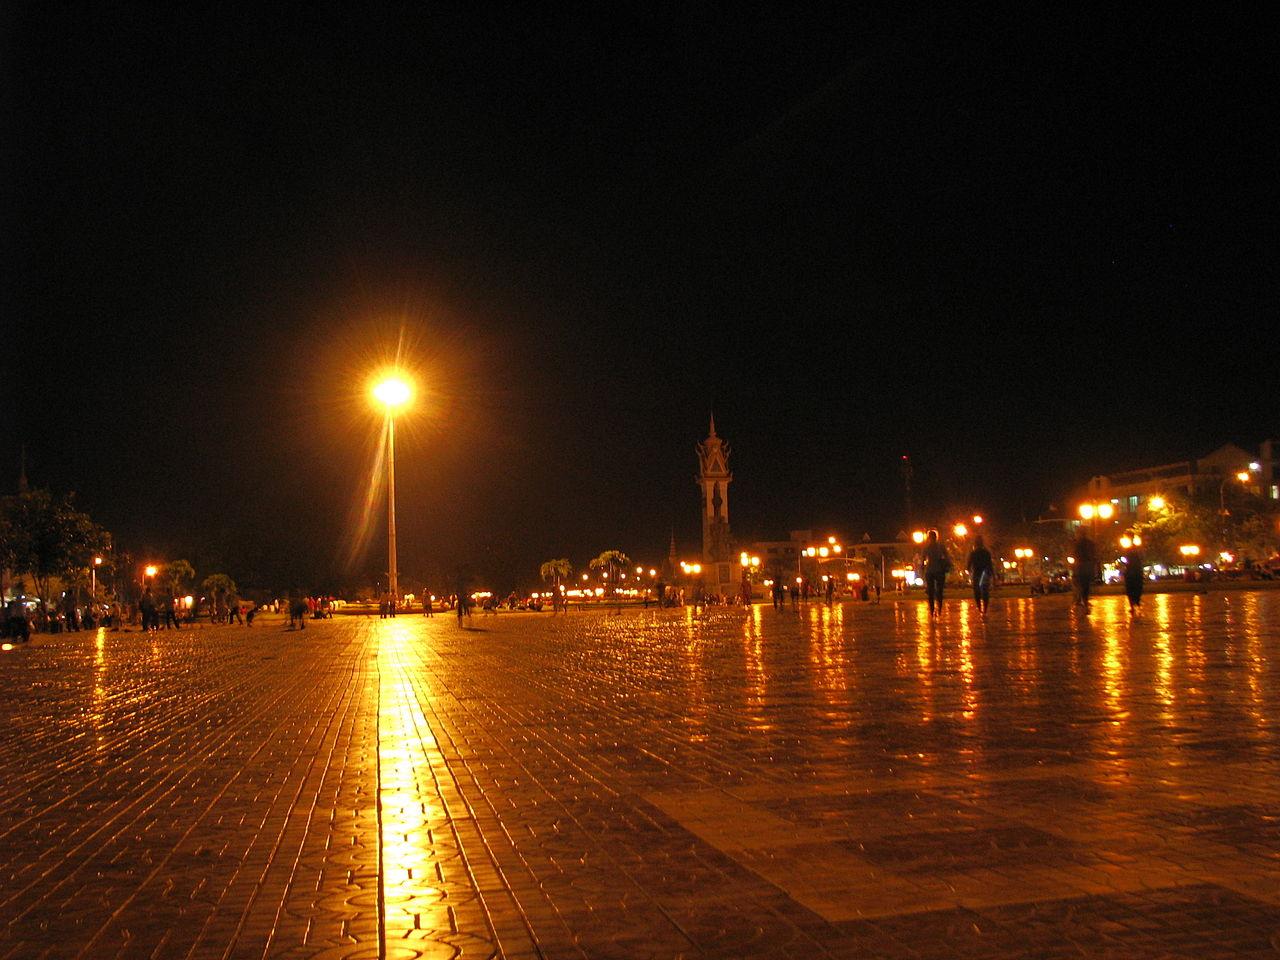 Cambodia at night